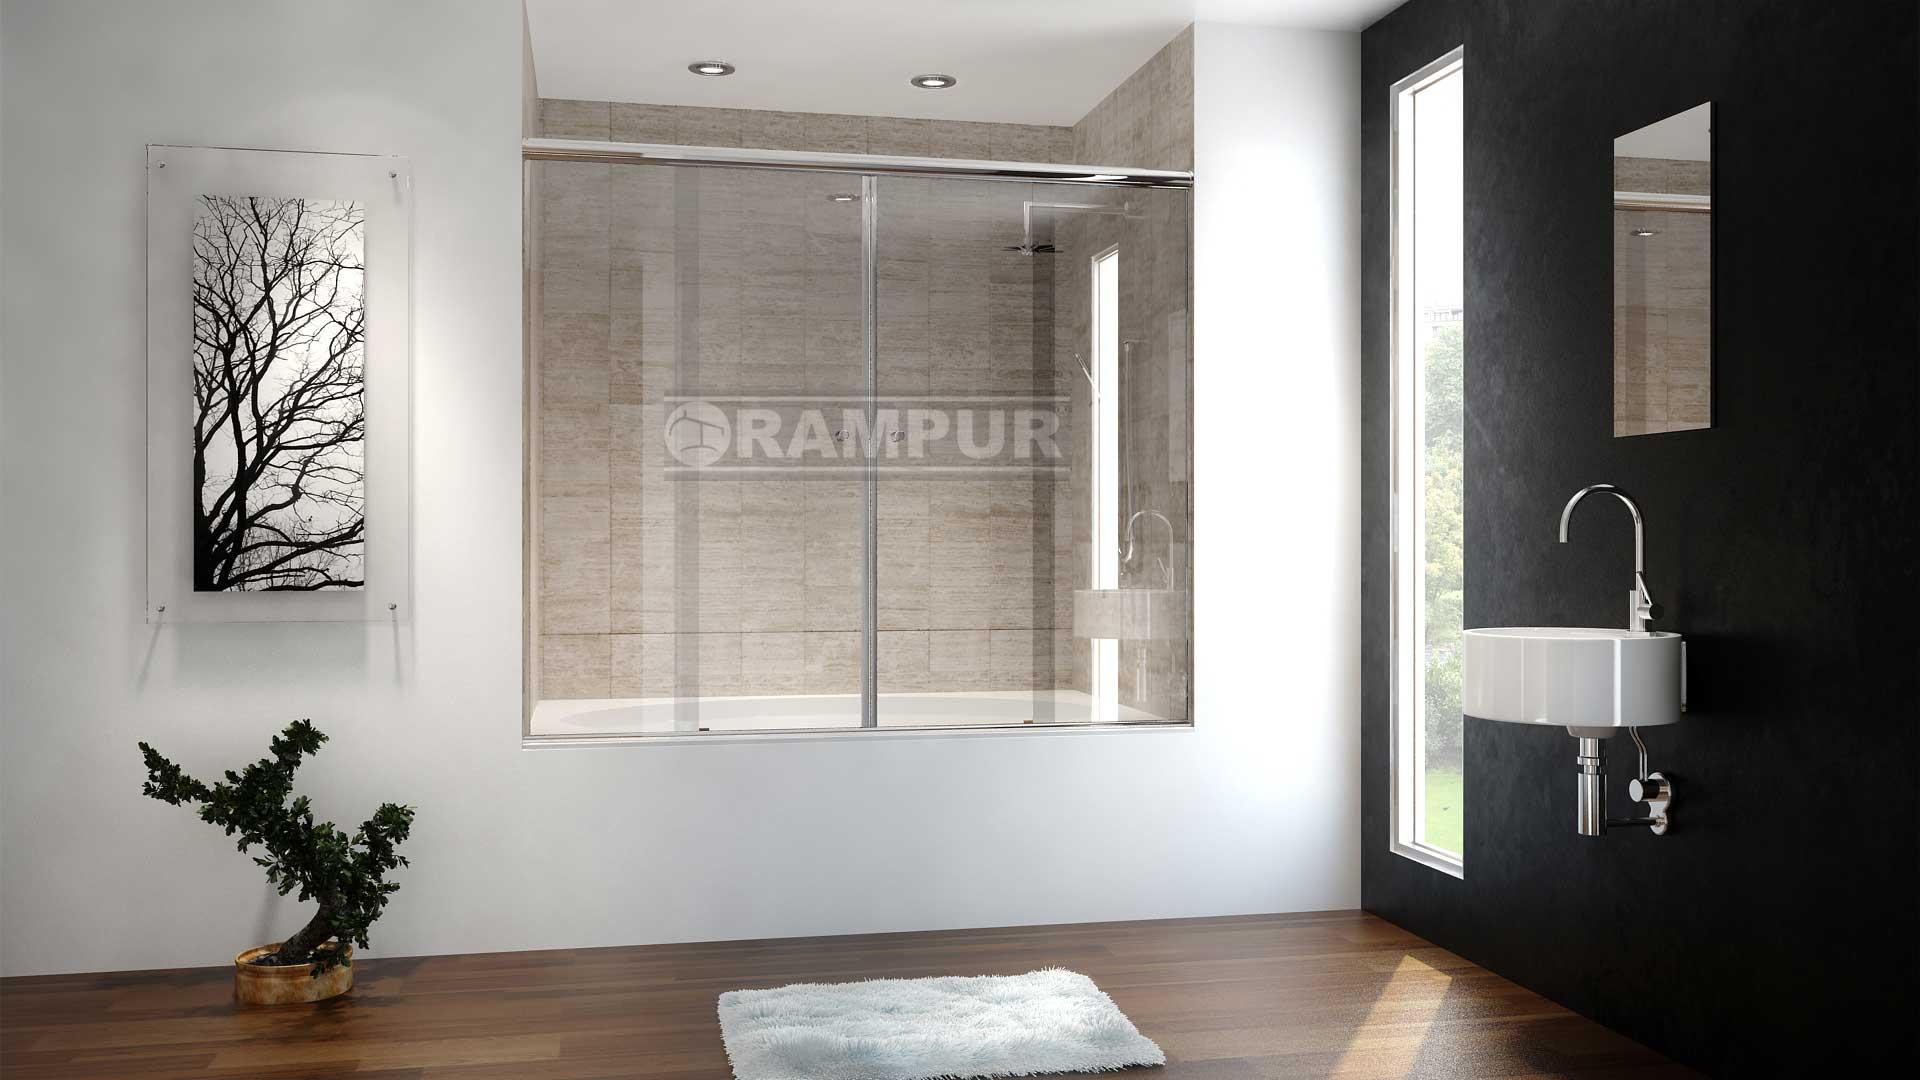 Mamparas Para Baño Rampur:RAMPUR® Mamparas Para Baños De Vidrio LACAR Premium